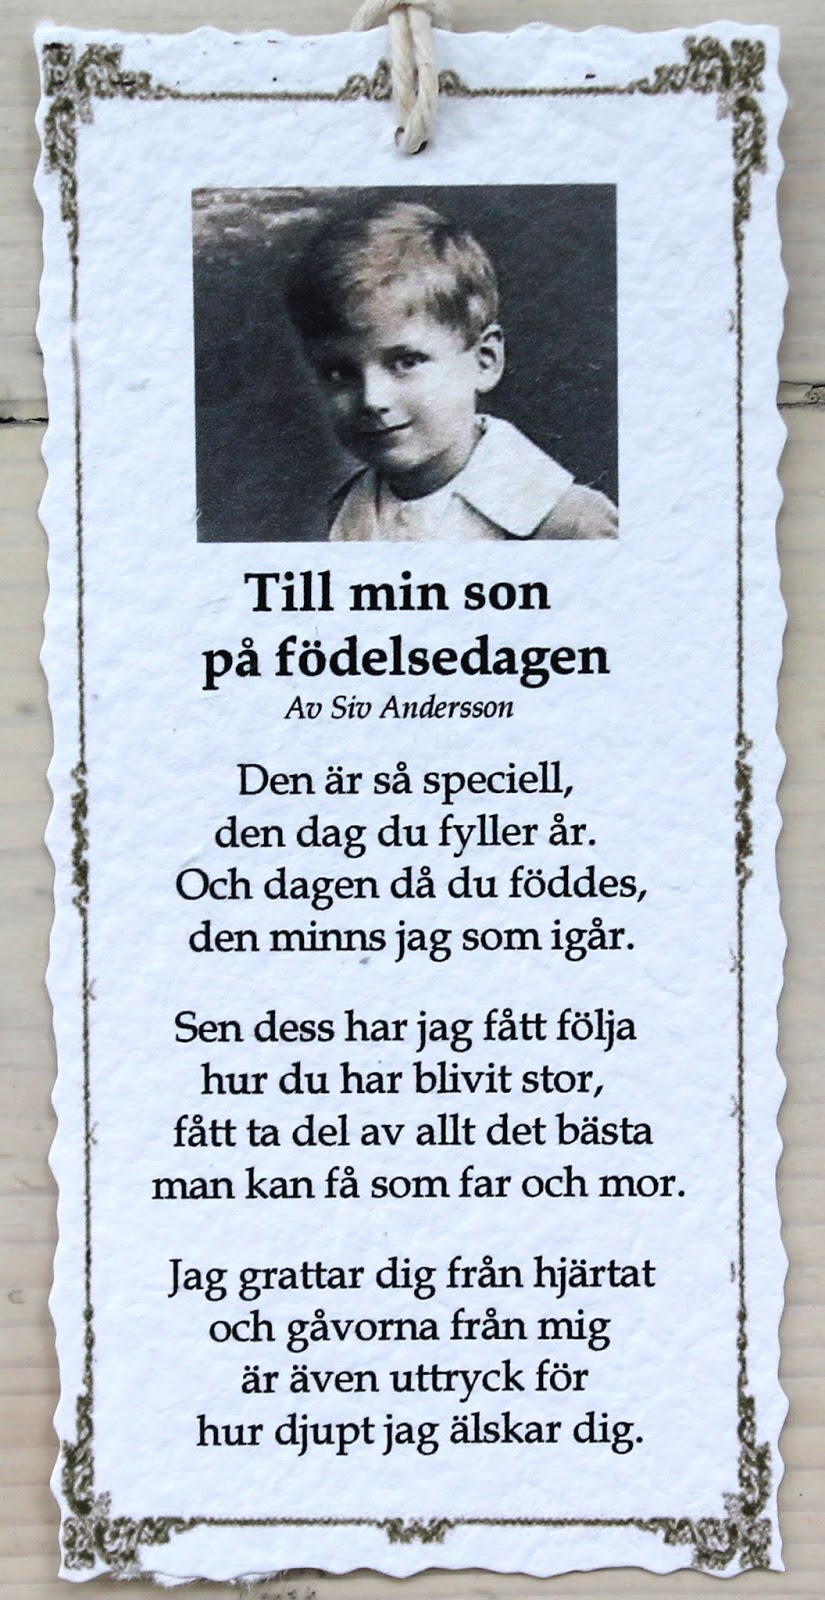 grattis brorsan dikt Annas idéer bloggbutik: september 2015 grattis brorsan dikt